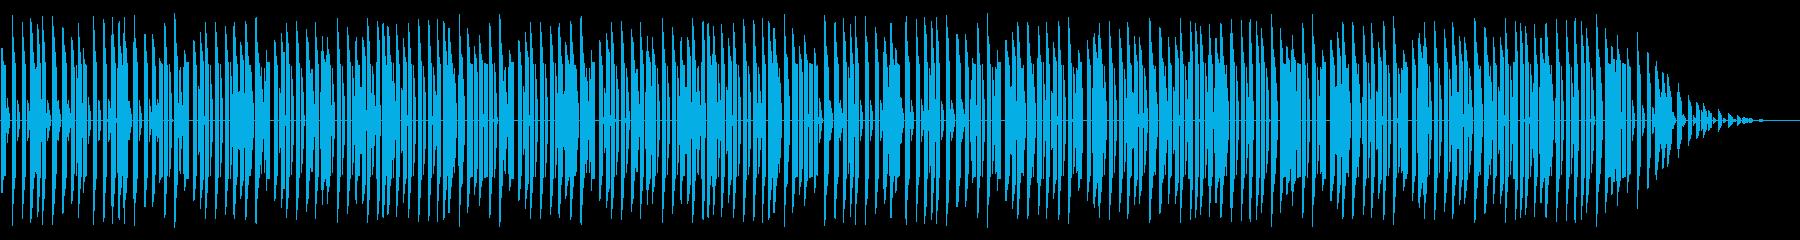 NES RPG B03-1(街1) の再生済みの波形